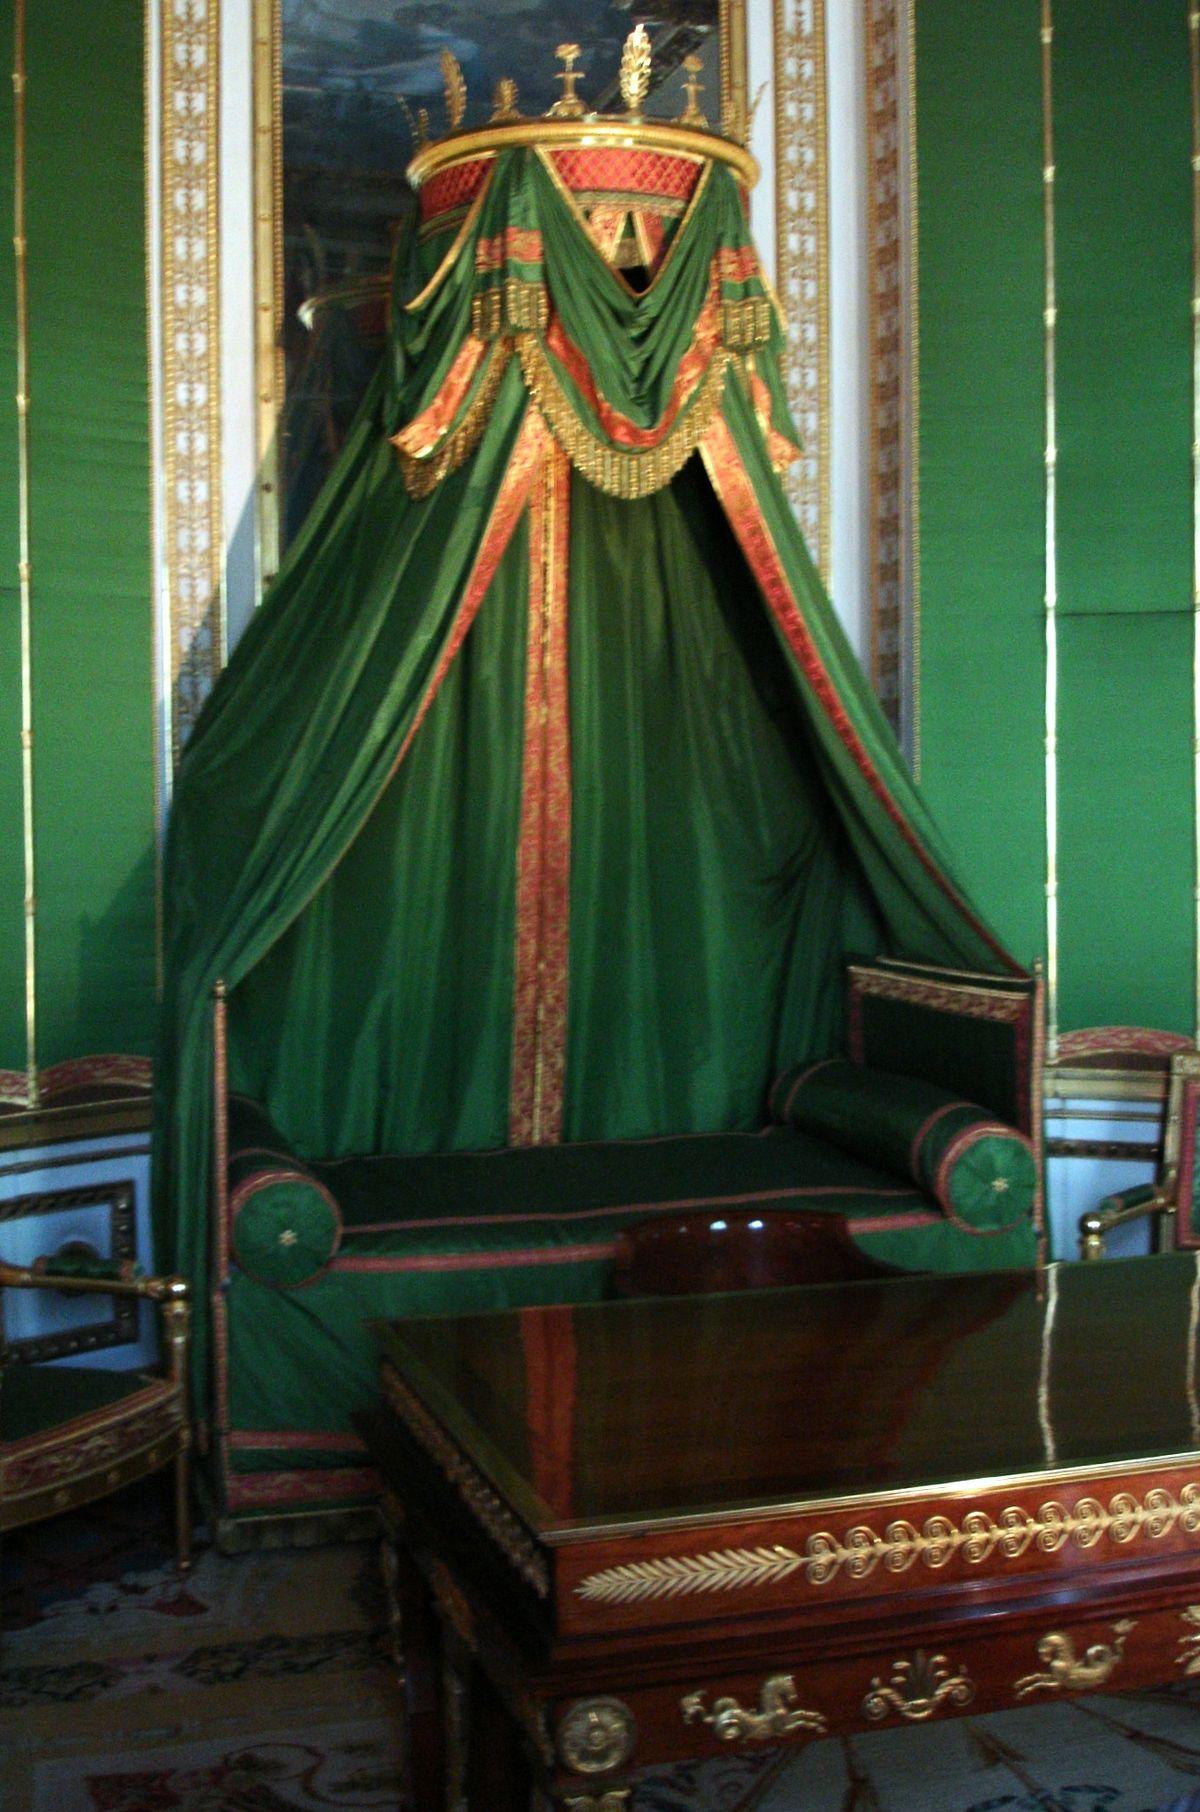 Couleur Vert Emeraude Foncé vert impérial — wikipédia